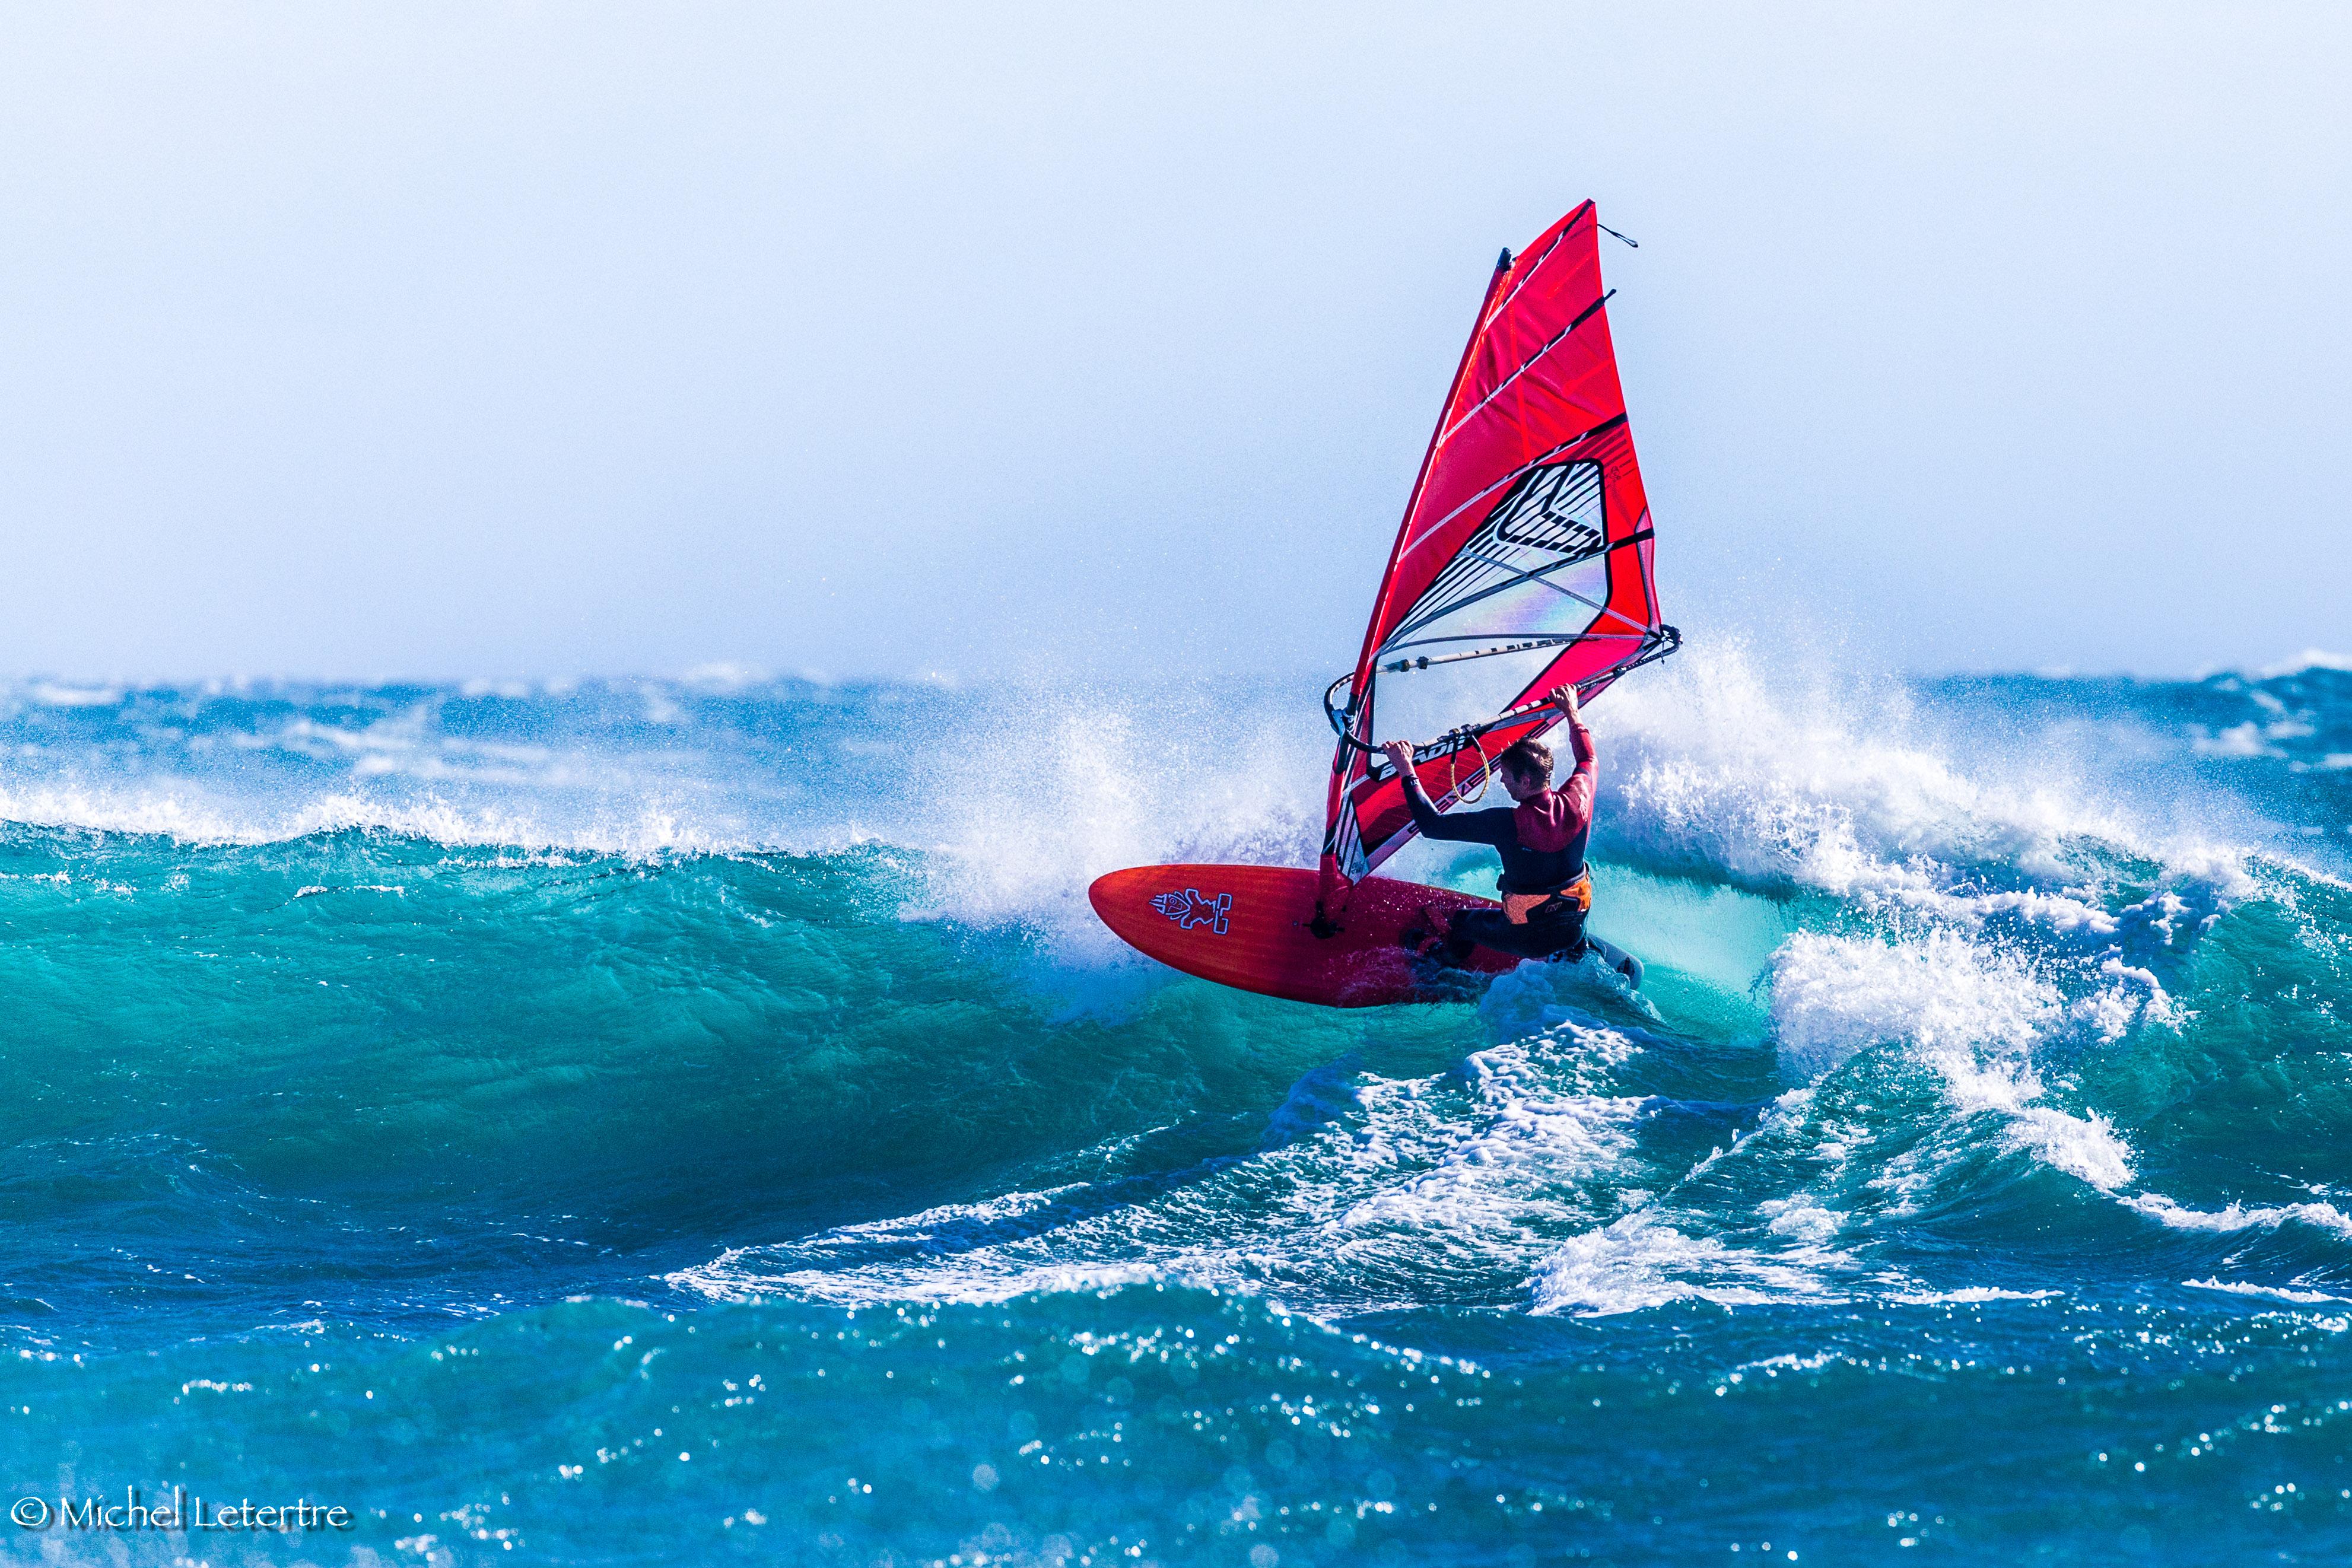 Wallpaper Windsurfing Surfing Equipment And Supplies